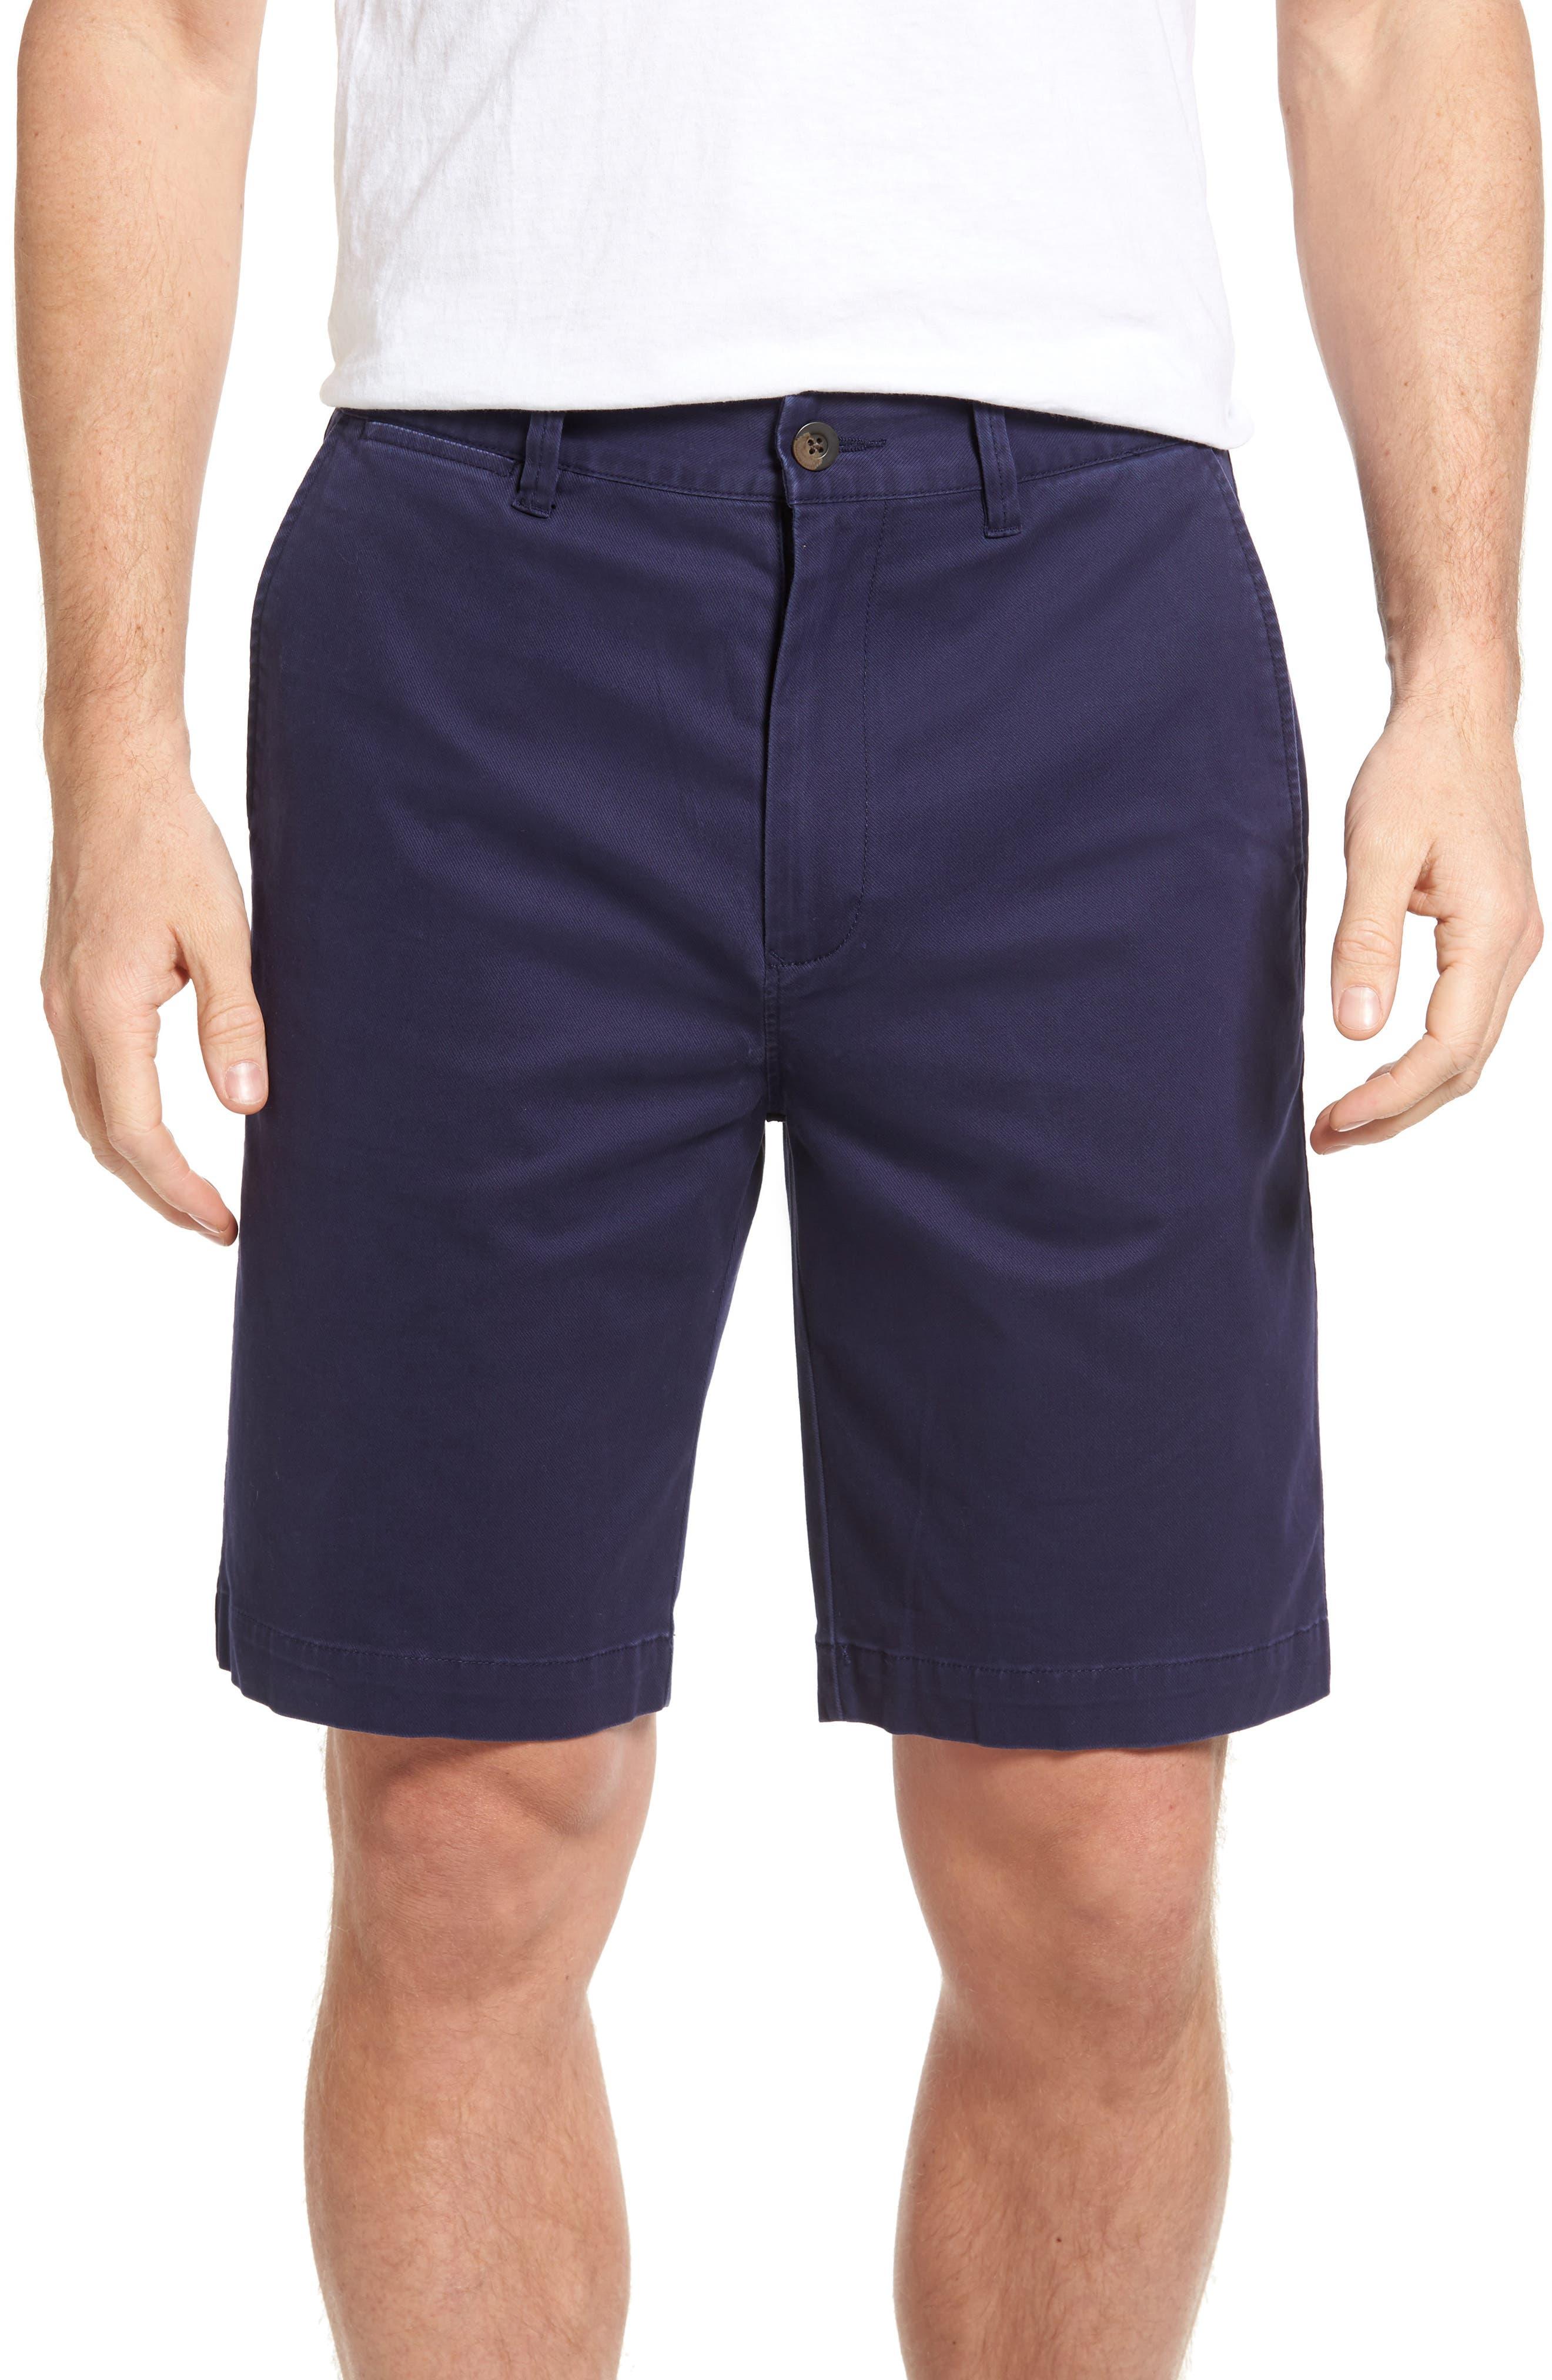 Rodd & Gunn Peel Forest Chino Shorts